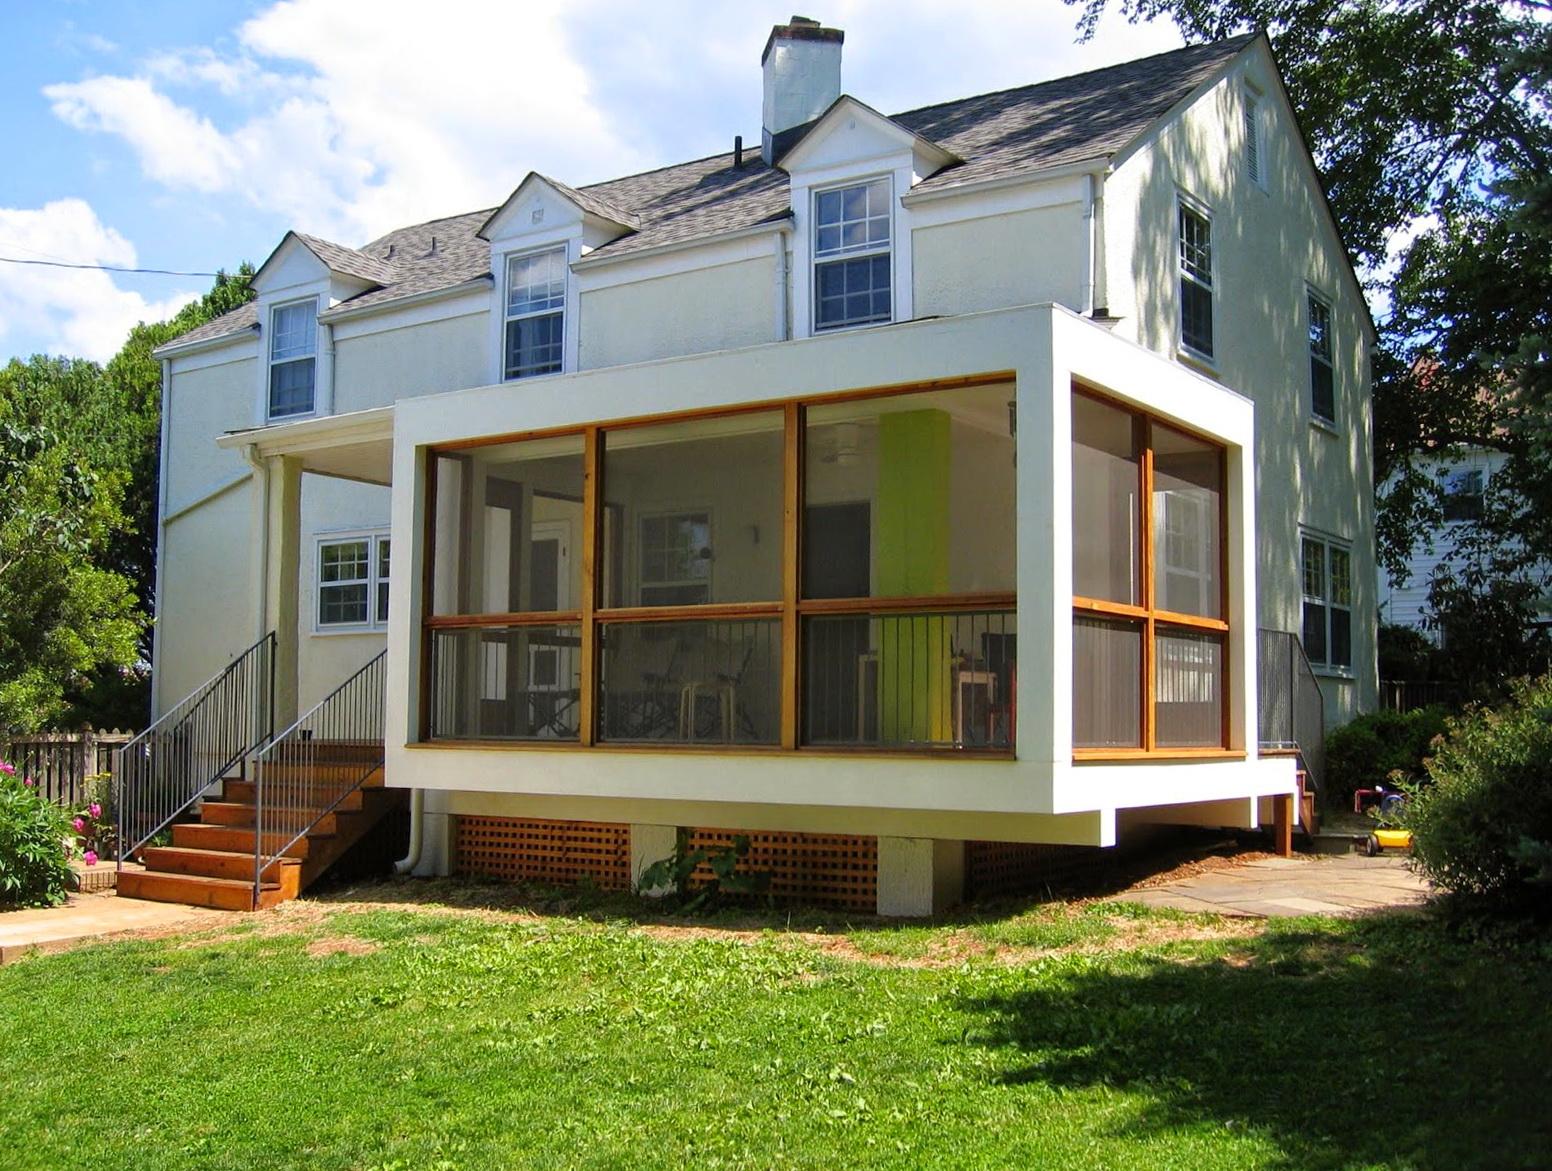 Screened back porch designs home design ideas for Screened in back porch designs